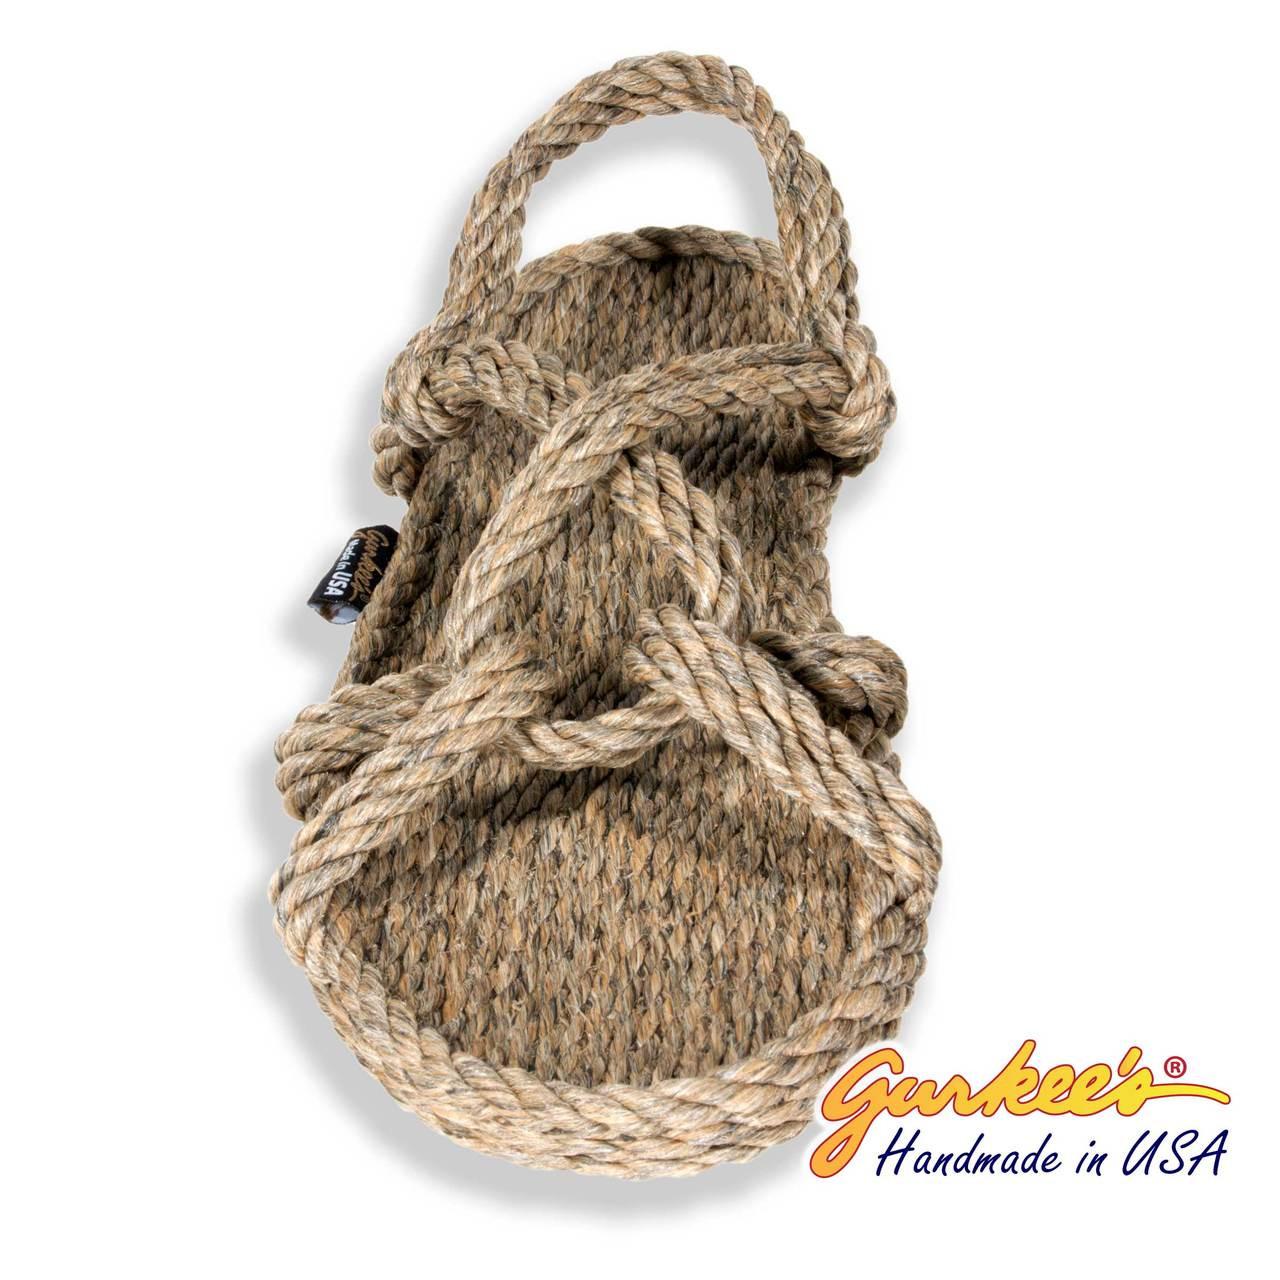 dc51df73eba Signature Barbados Hemp Color Rope Sandals - Gurkee s